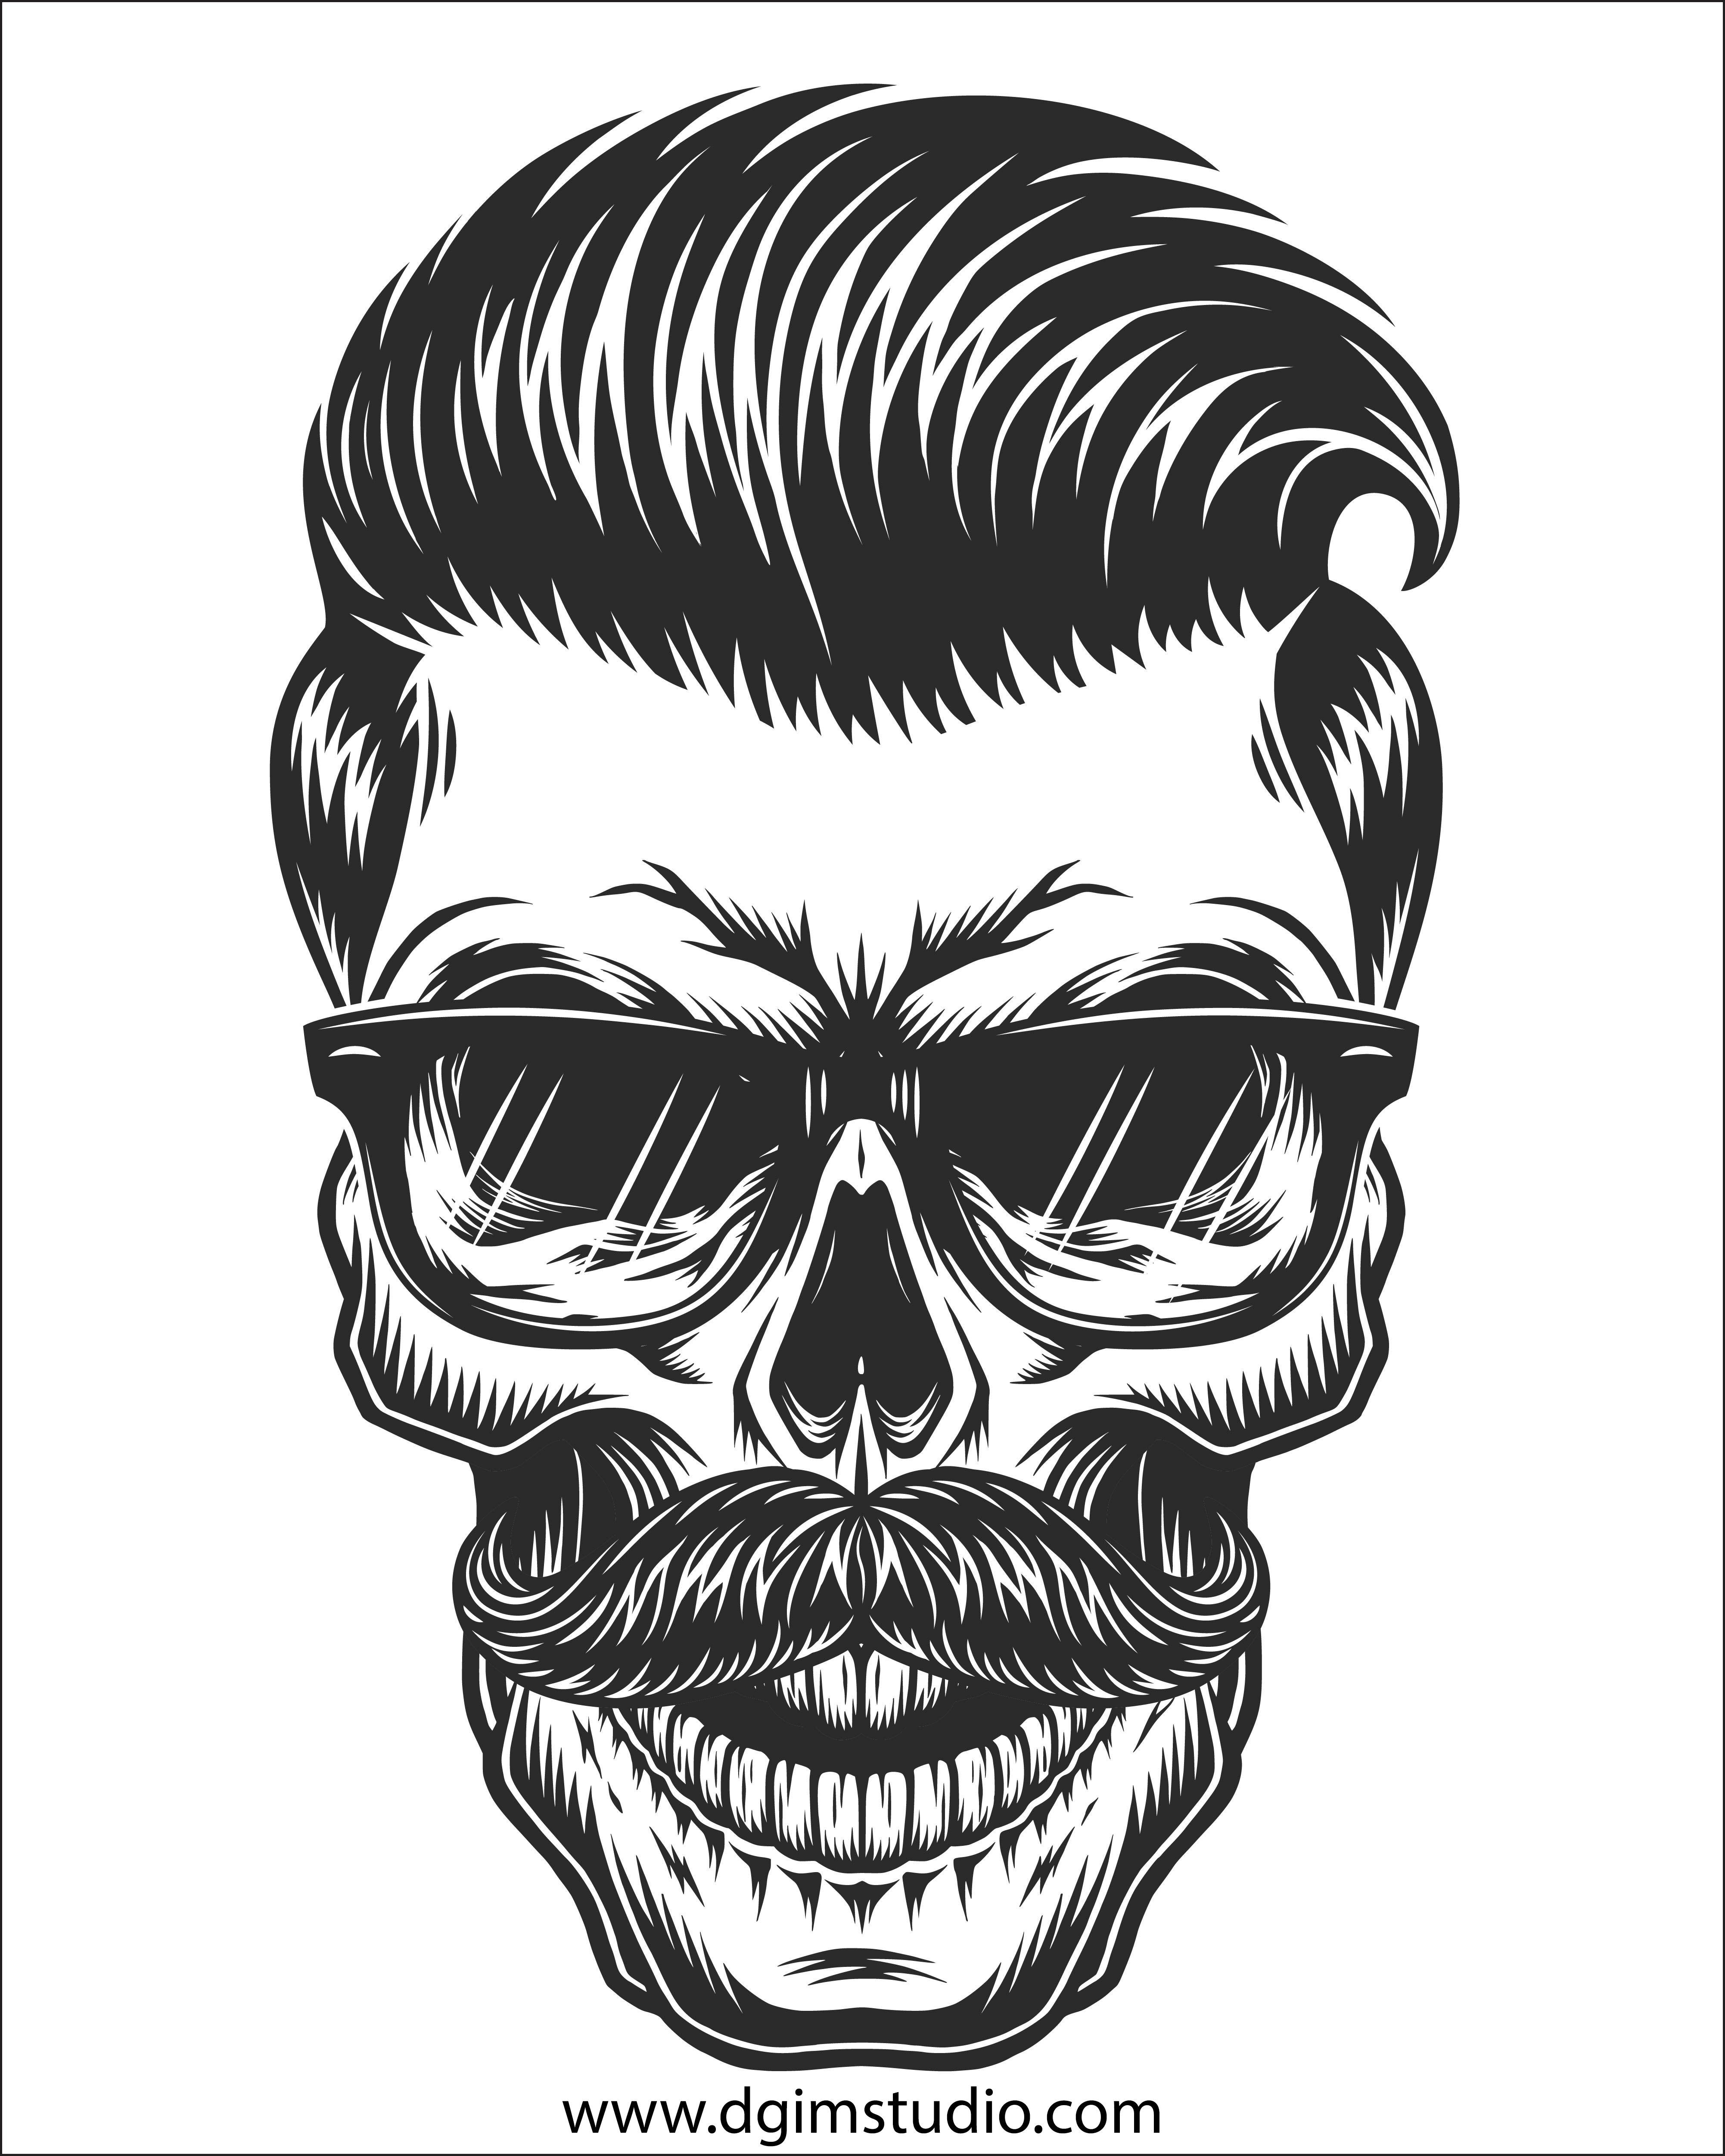 Skull creator รอยสักวินเทจ หัวกะโหลก และ ไอเดียรอยสัก